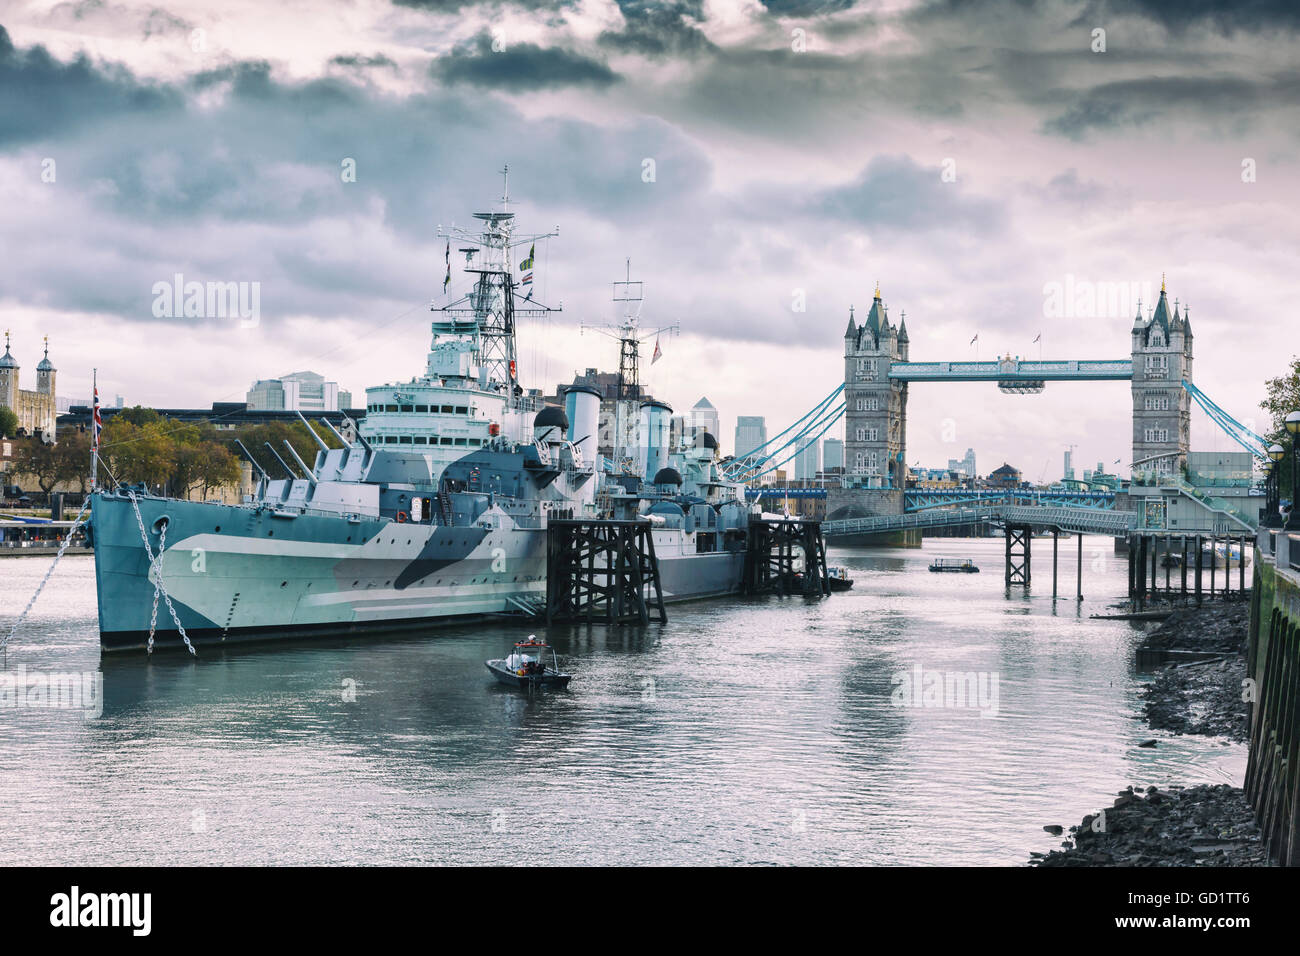 Tower Bridge, HMS Belfast ship and River Thames. London, United Kingdom, Europe - Stock Image